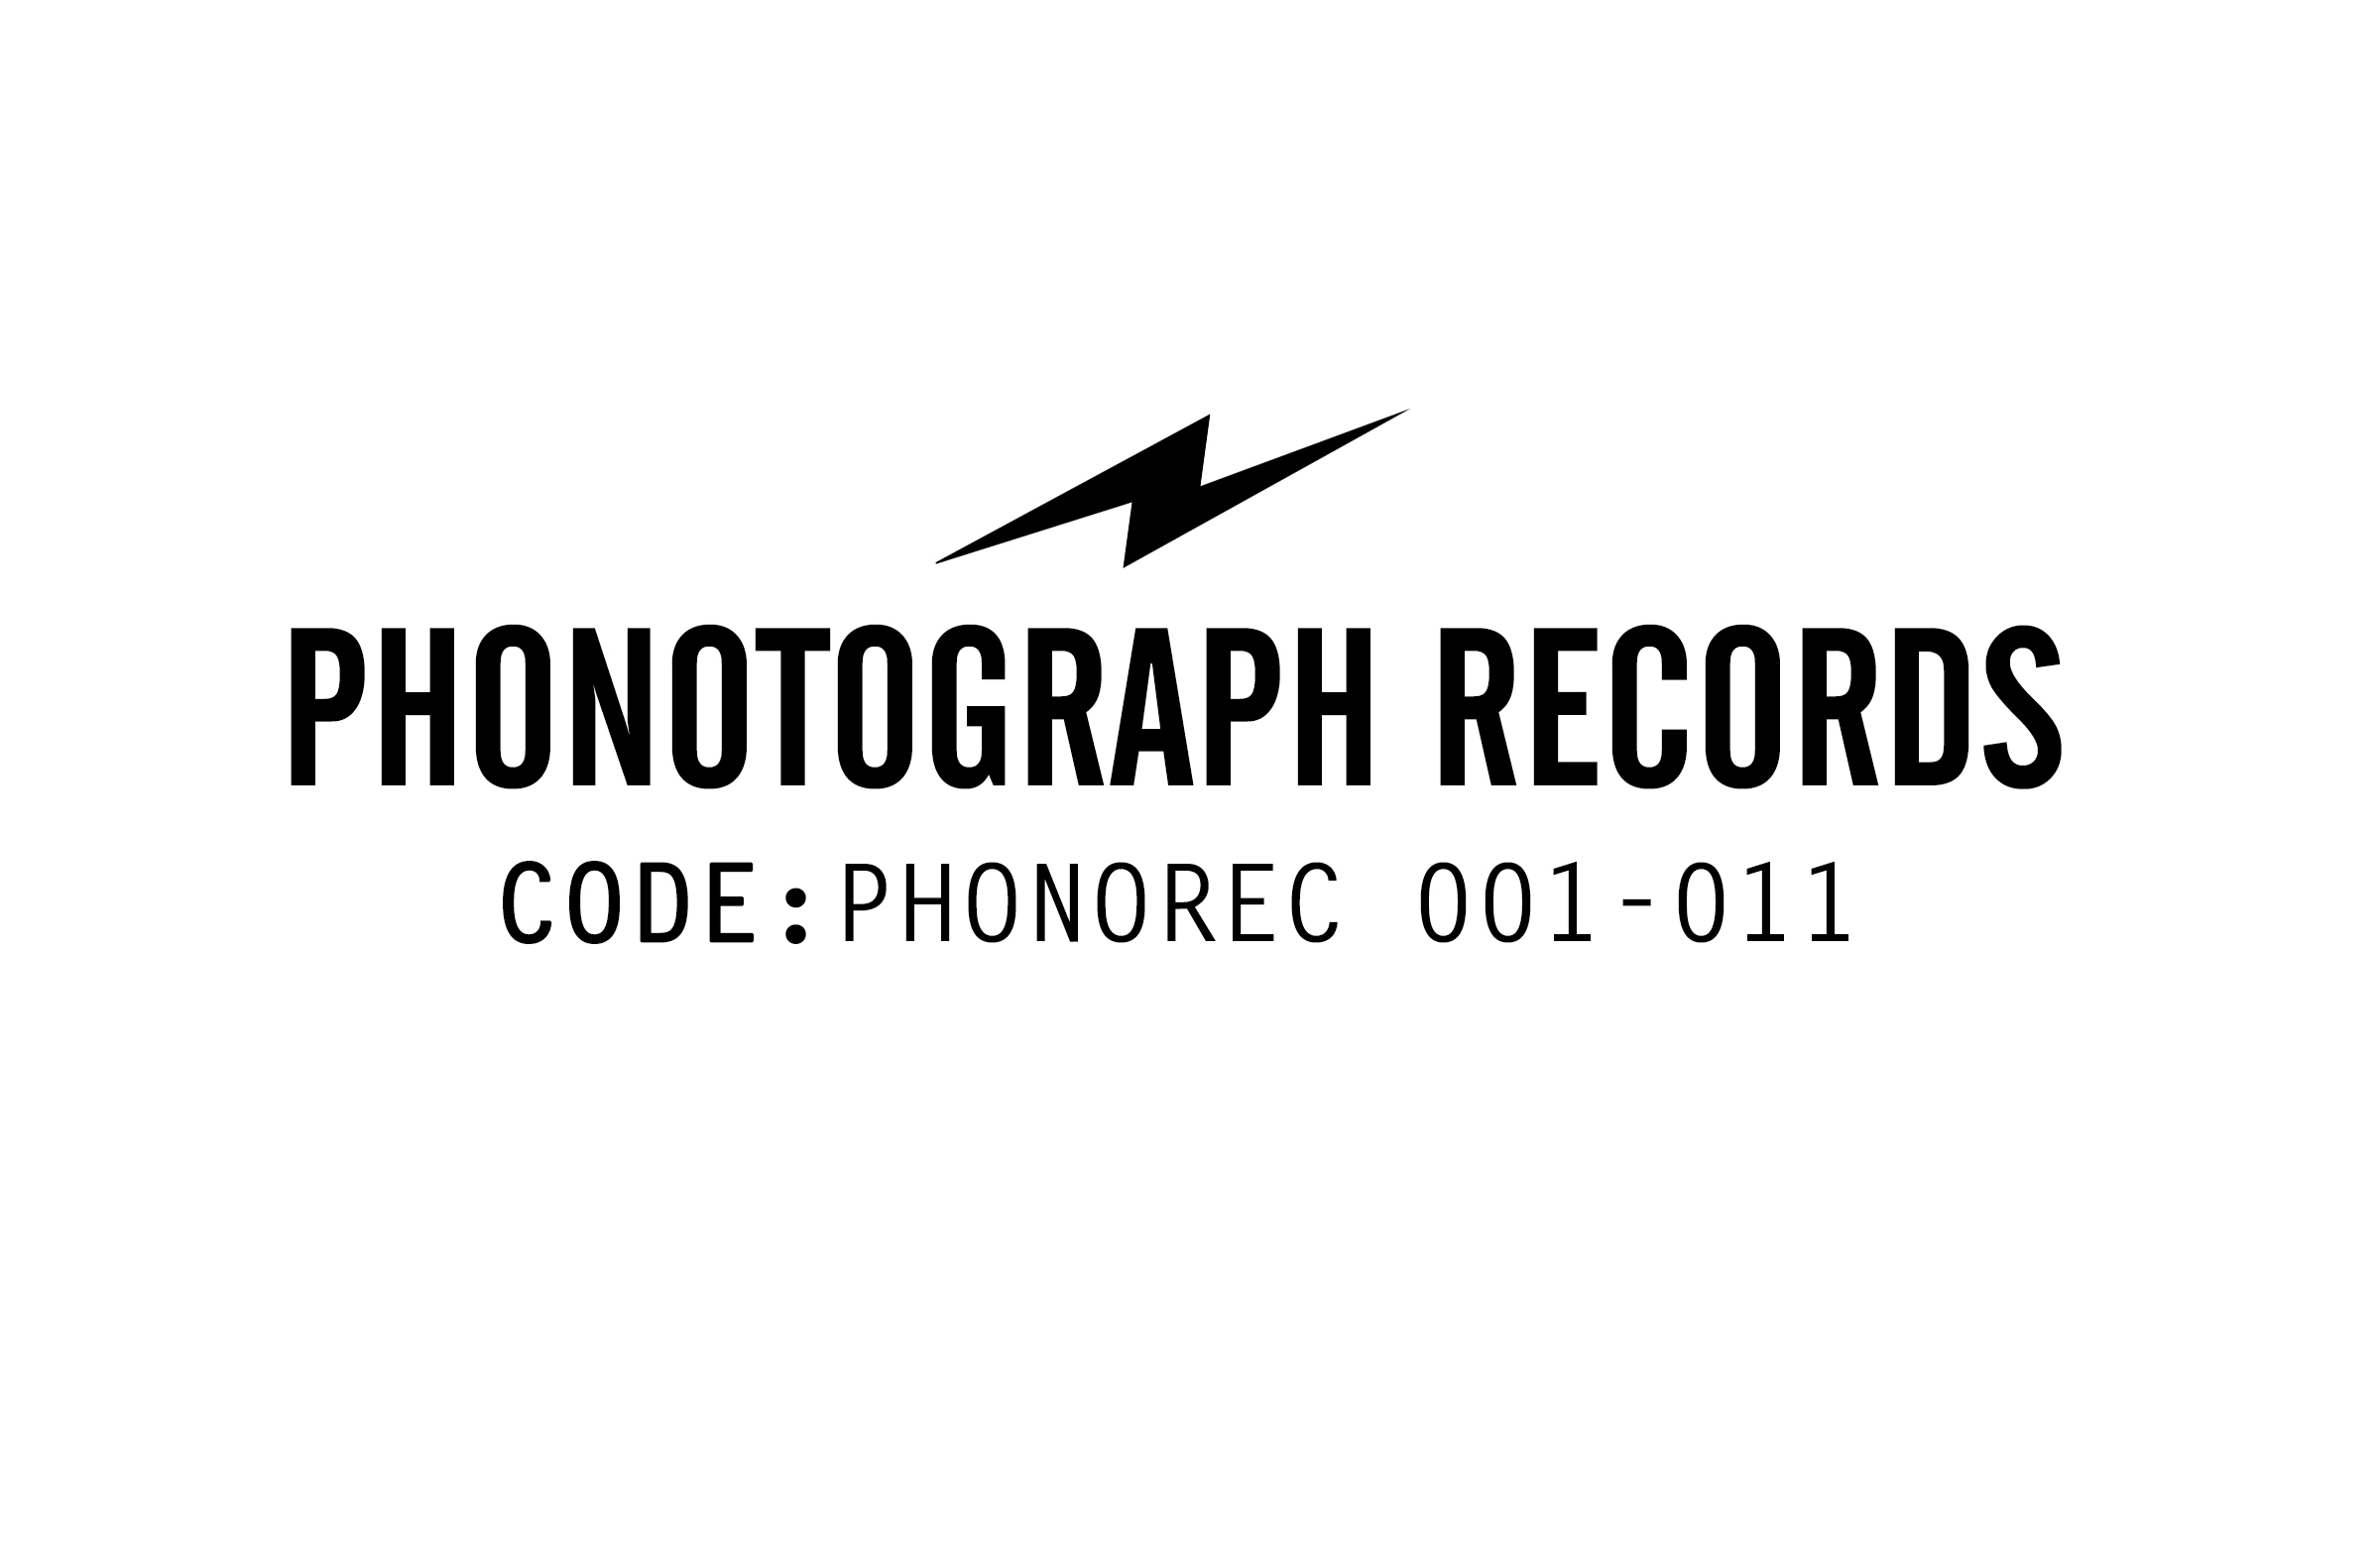 logo phonotograph records copy.jpg